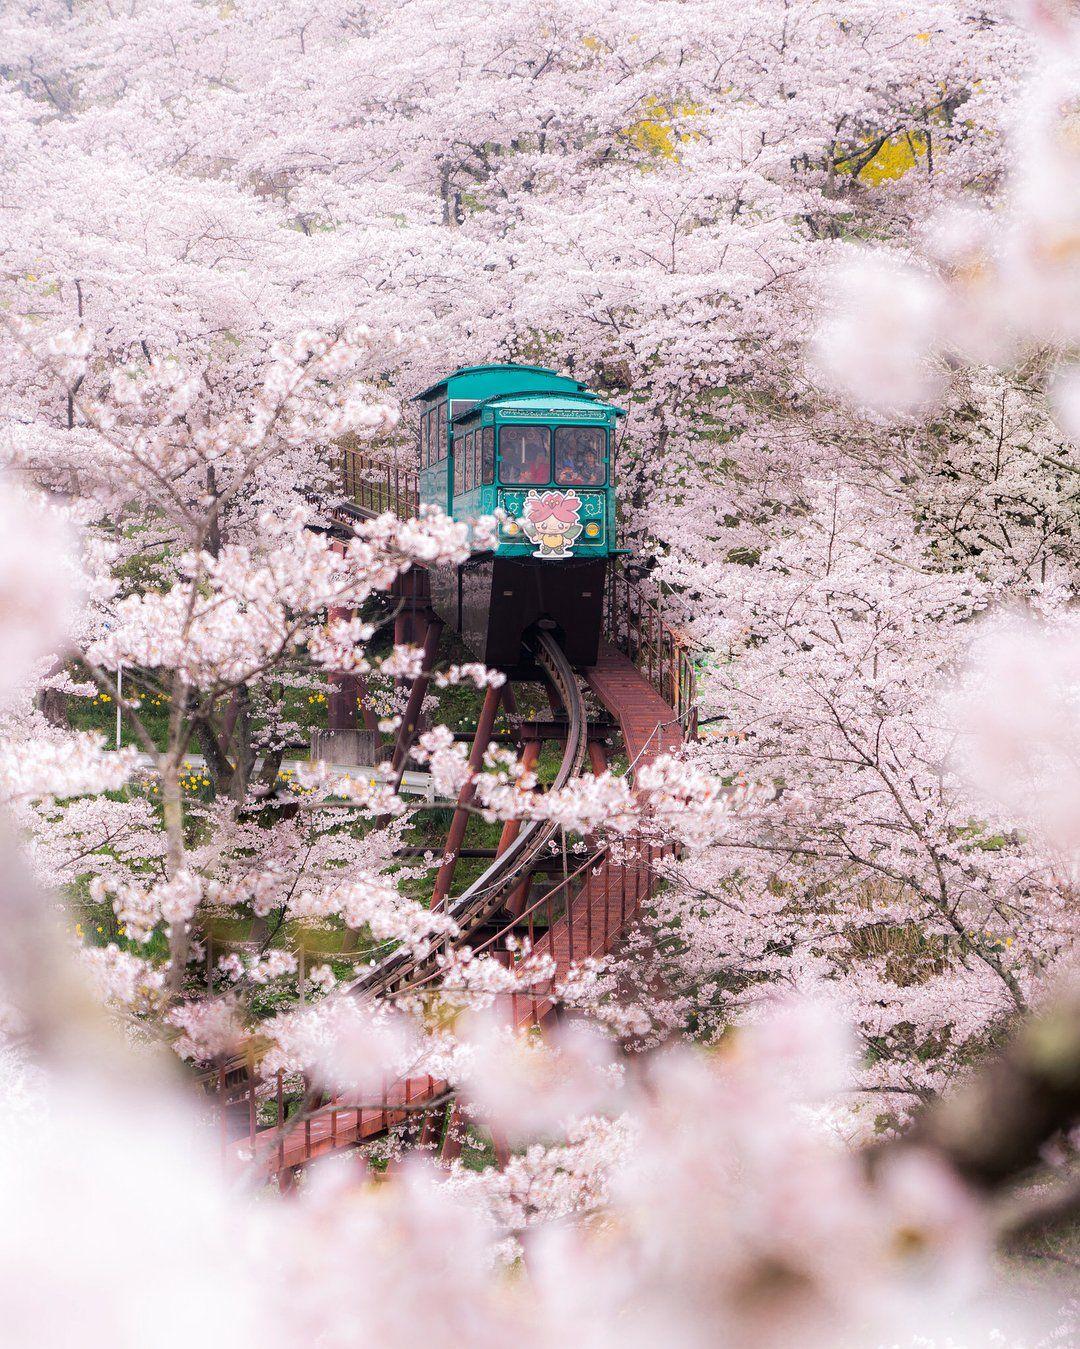 A Ride Through Cherry Blossoms In Fukushima Japan Mostbeautiful Cherry Blossom Japan Cherry Blossom Japan